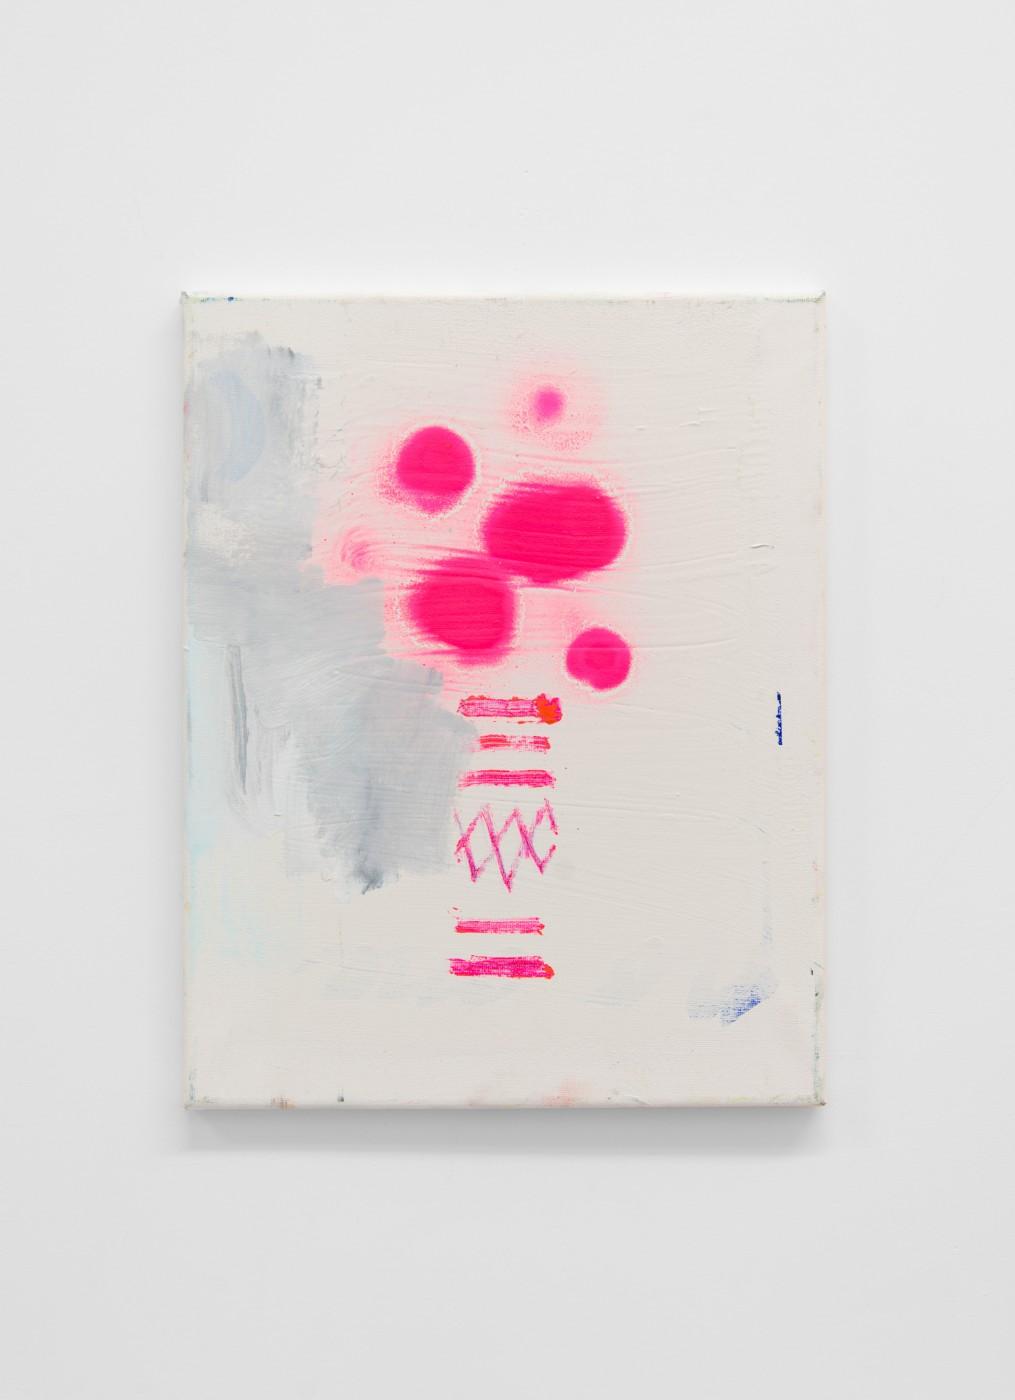 WALLFLOWERS, MALFLOWERS  Small flower 35 , 2018  Oil on canvas   35 x 27,5 cm / 14 x 11 in  Nathan Zeidman